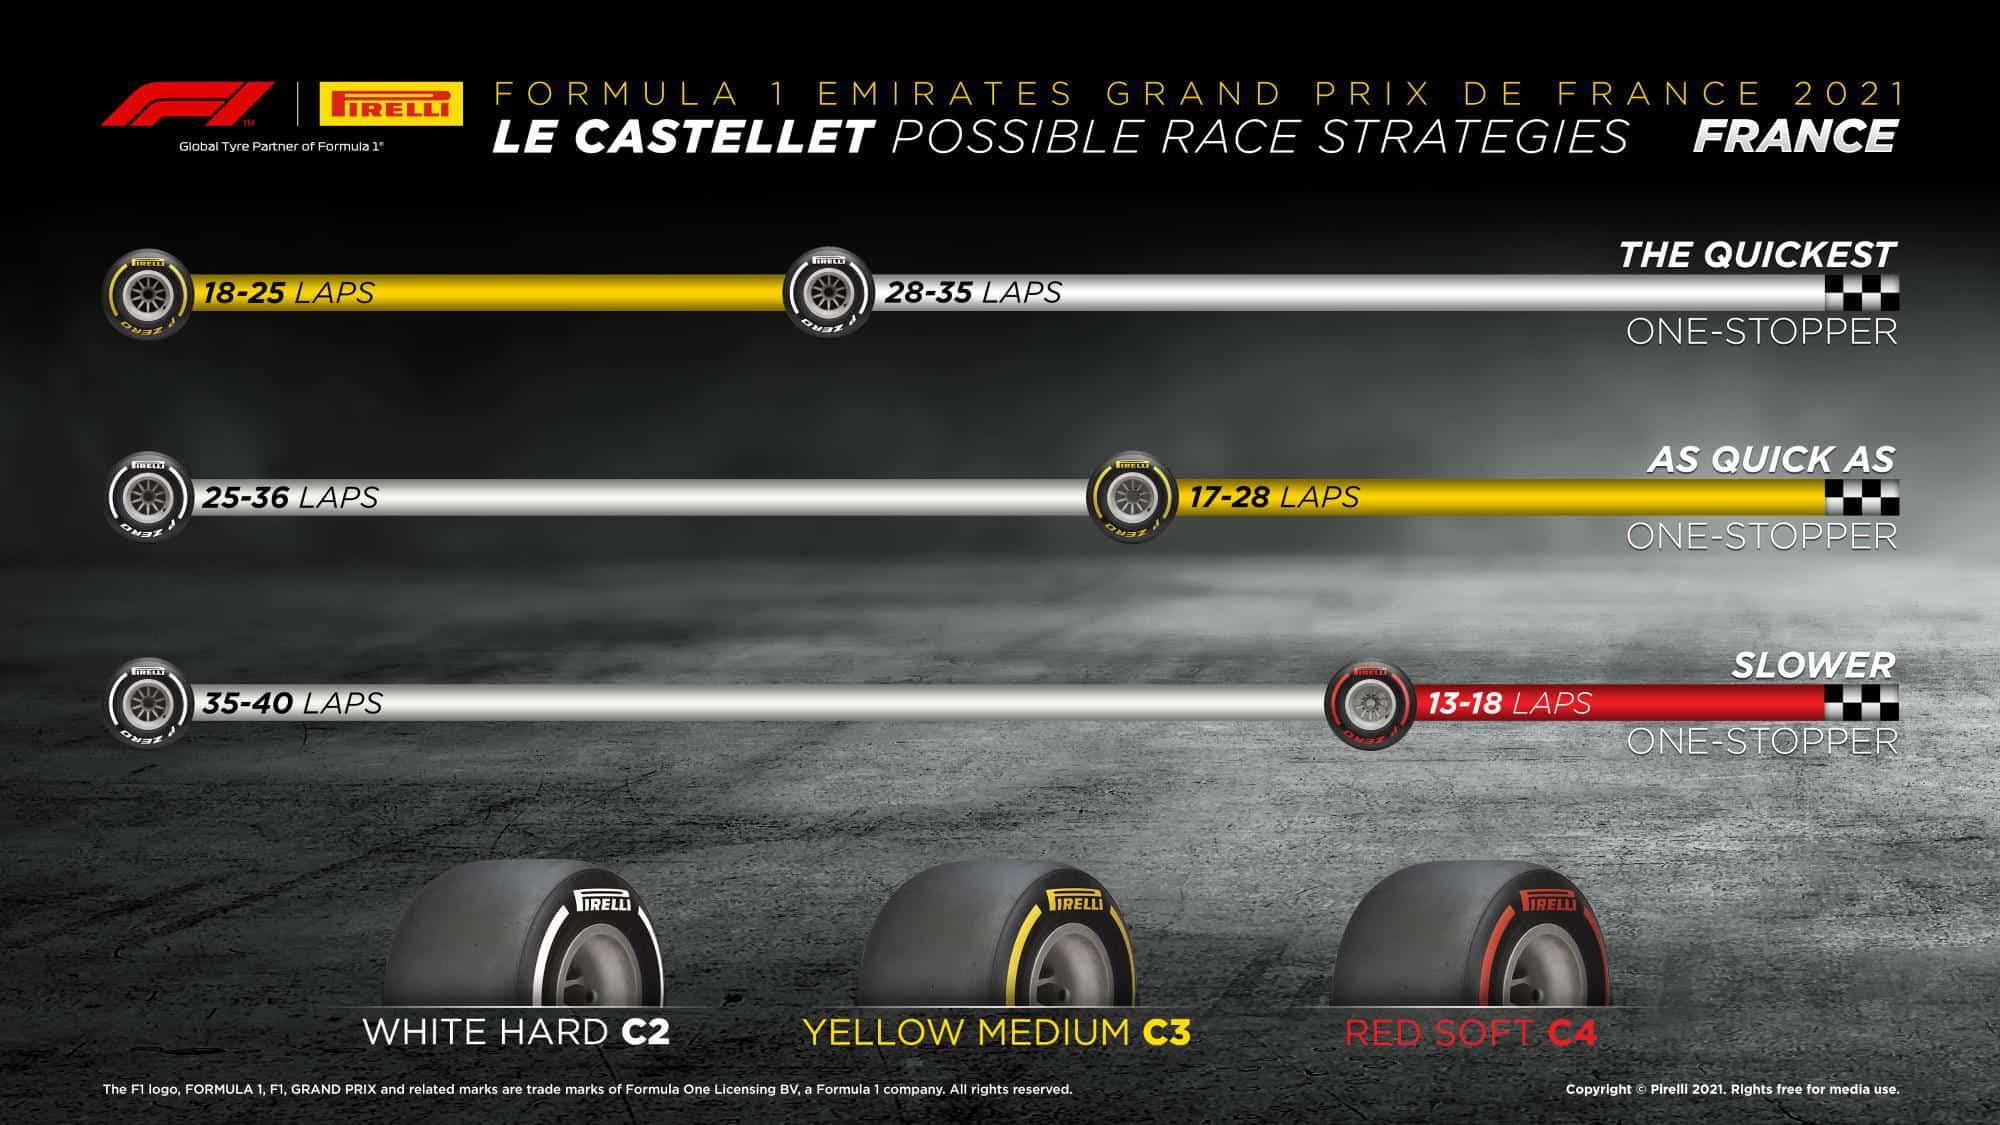 2021 French GP possible strategies Photo Pirelli Edited by MAXF1net